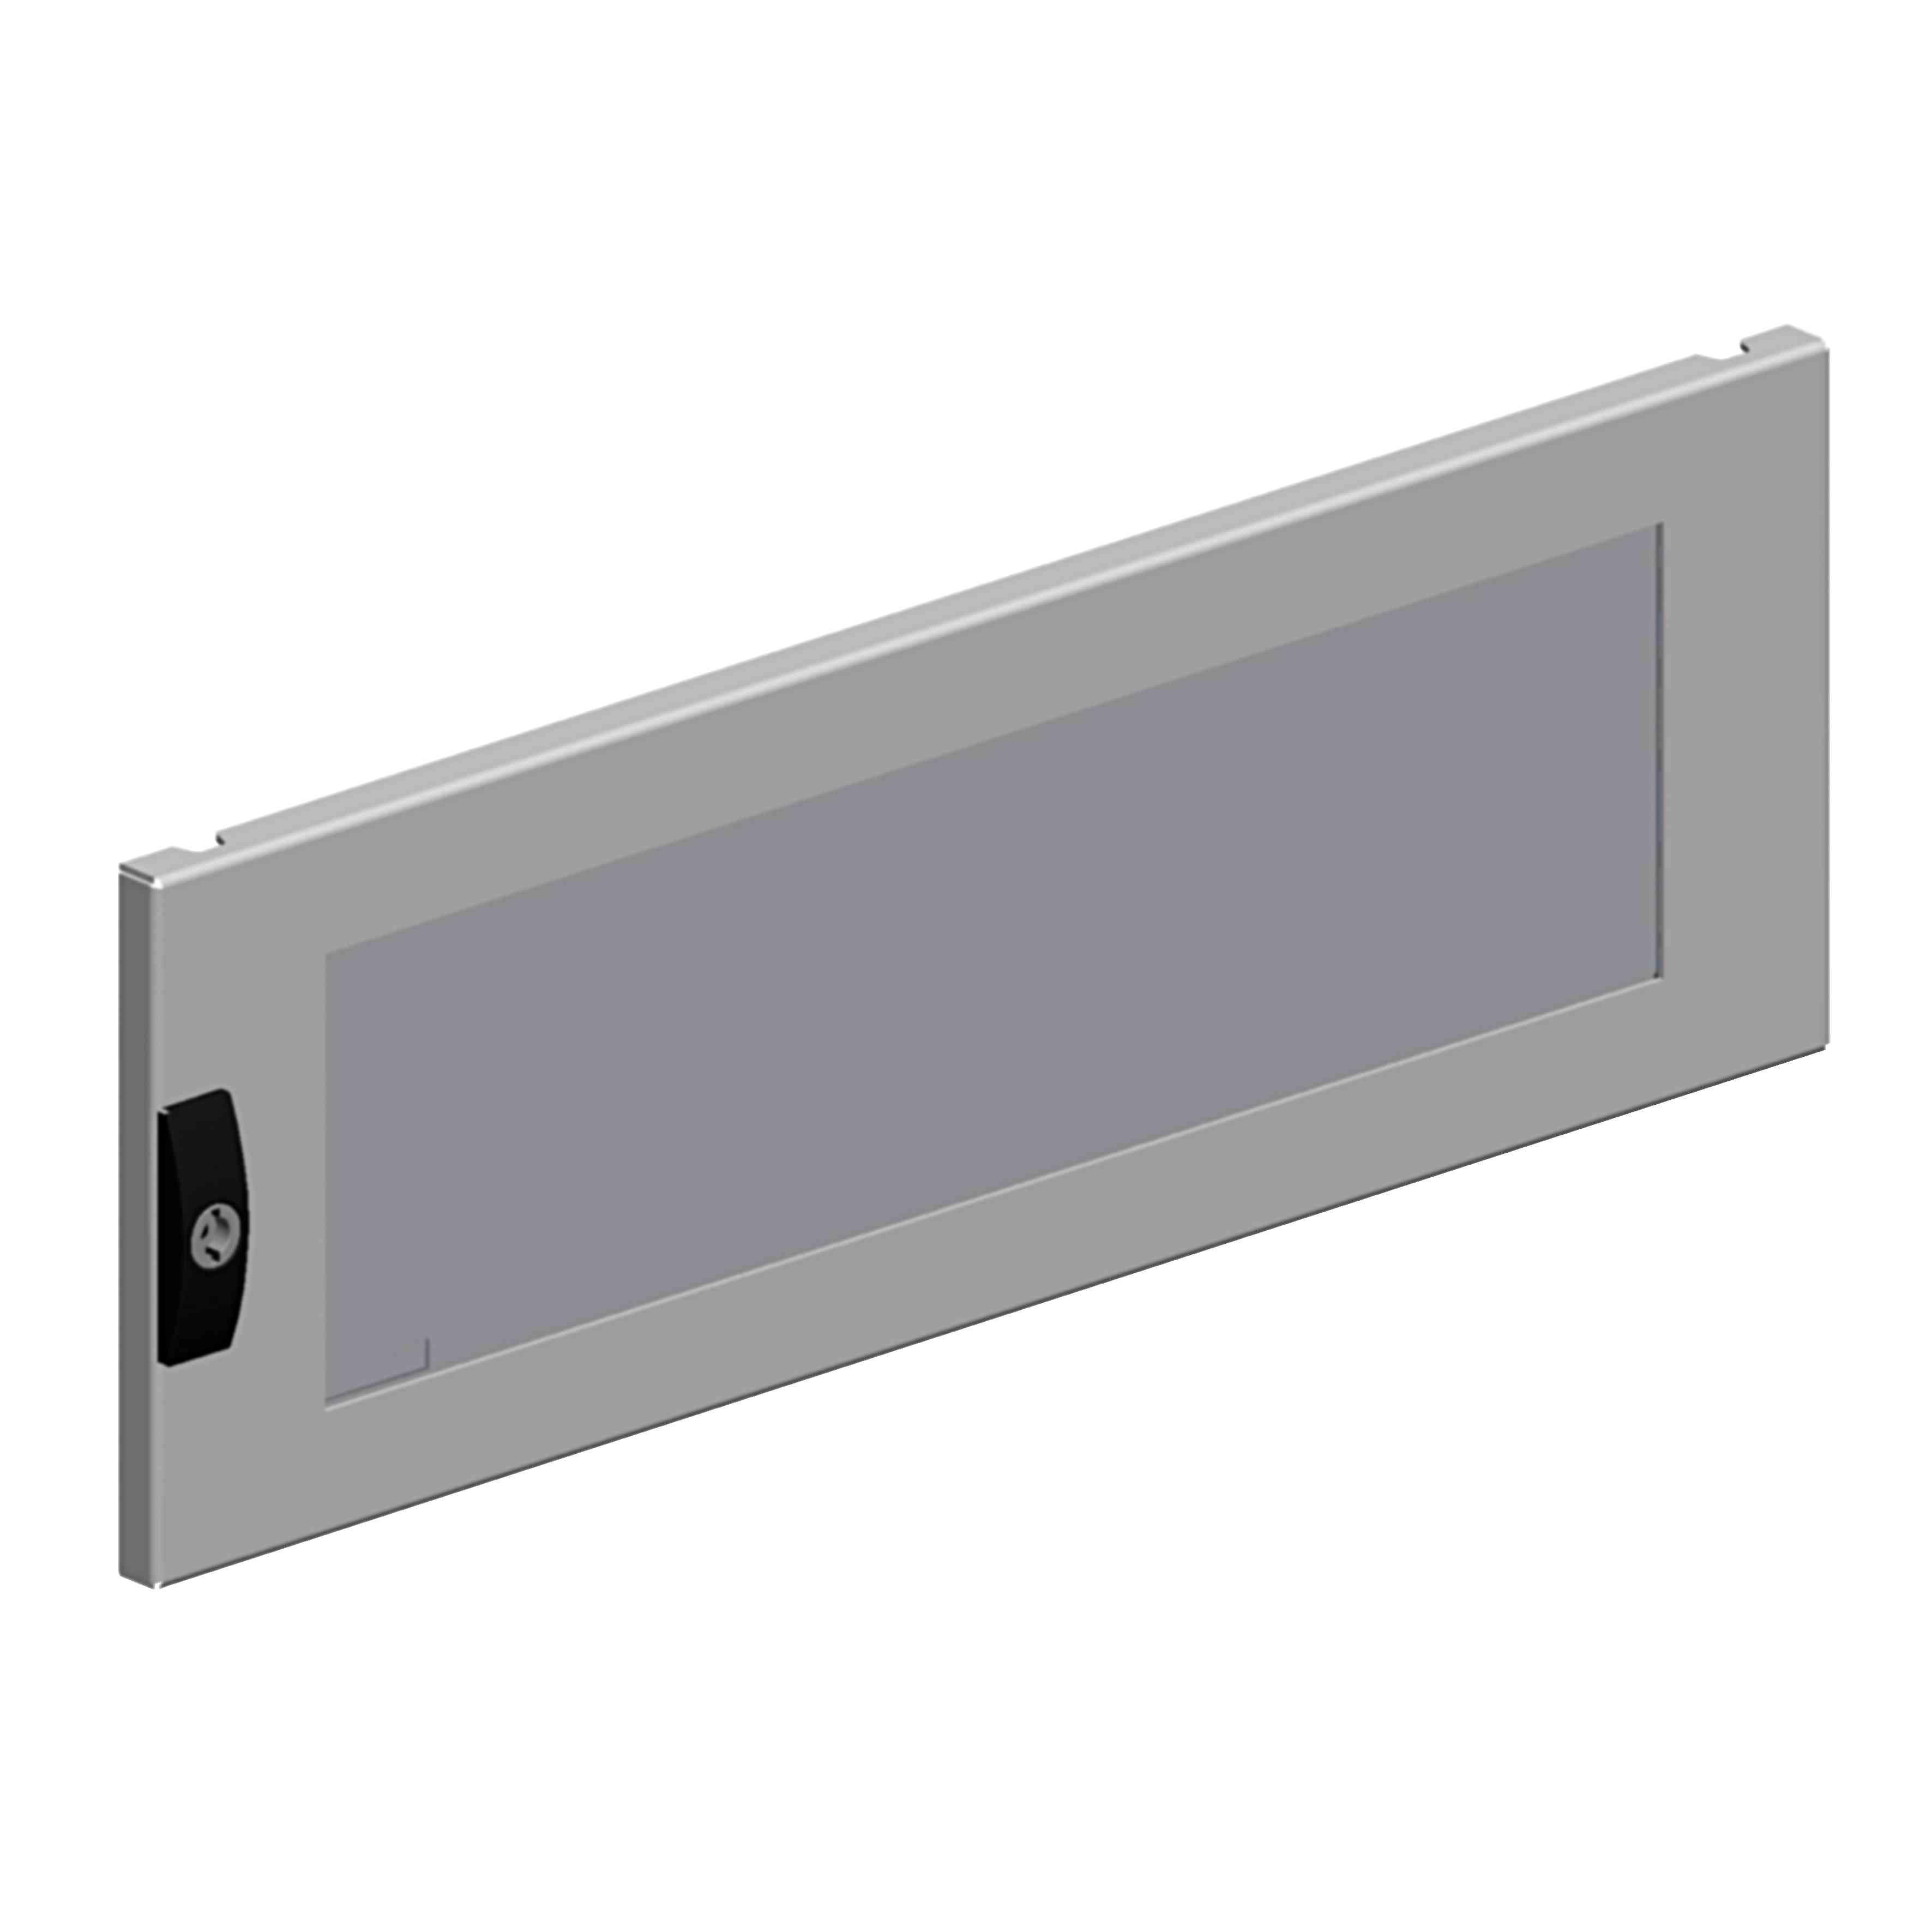 Spacial SF prosojna vrata - 1000 x 800 mm